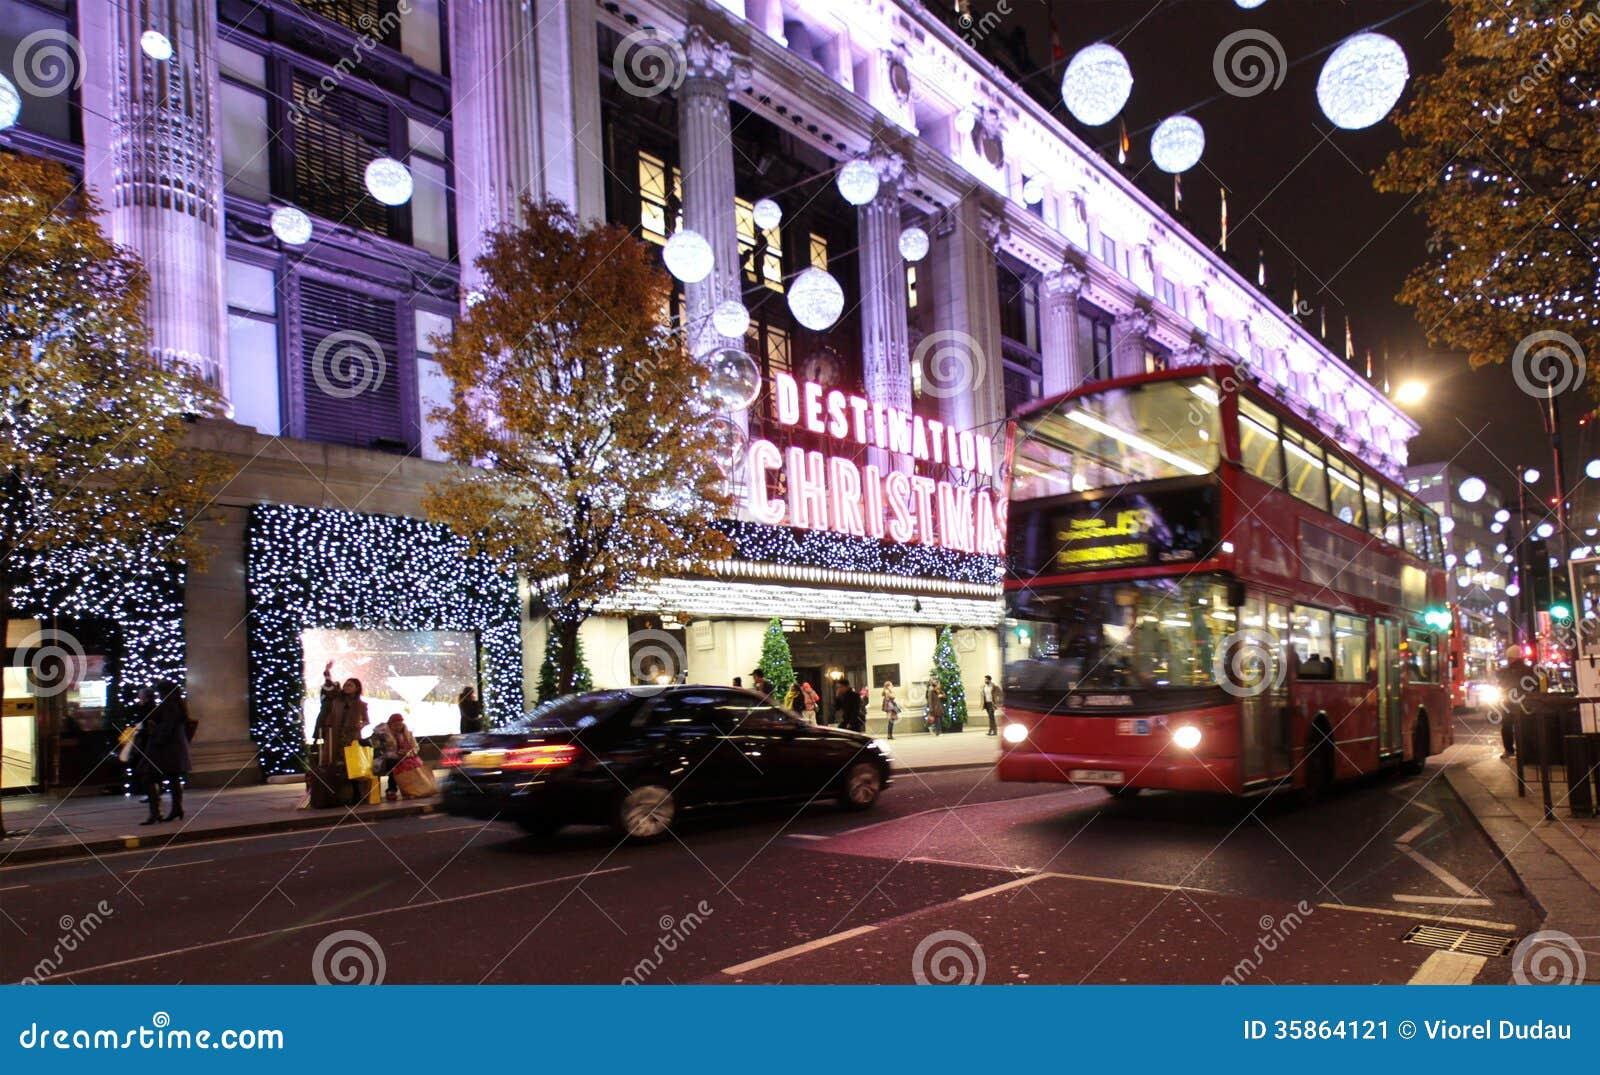 #6B3E8D Lumières De Noël De Londres Photo éditorial Image: 35864121 5317 decorations de noel a londres 1300x890 px @ aertt.com